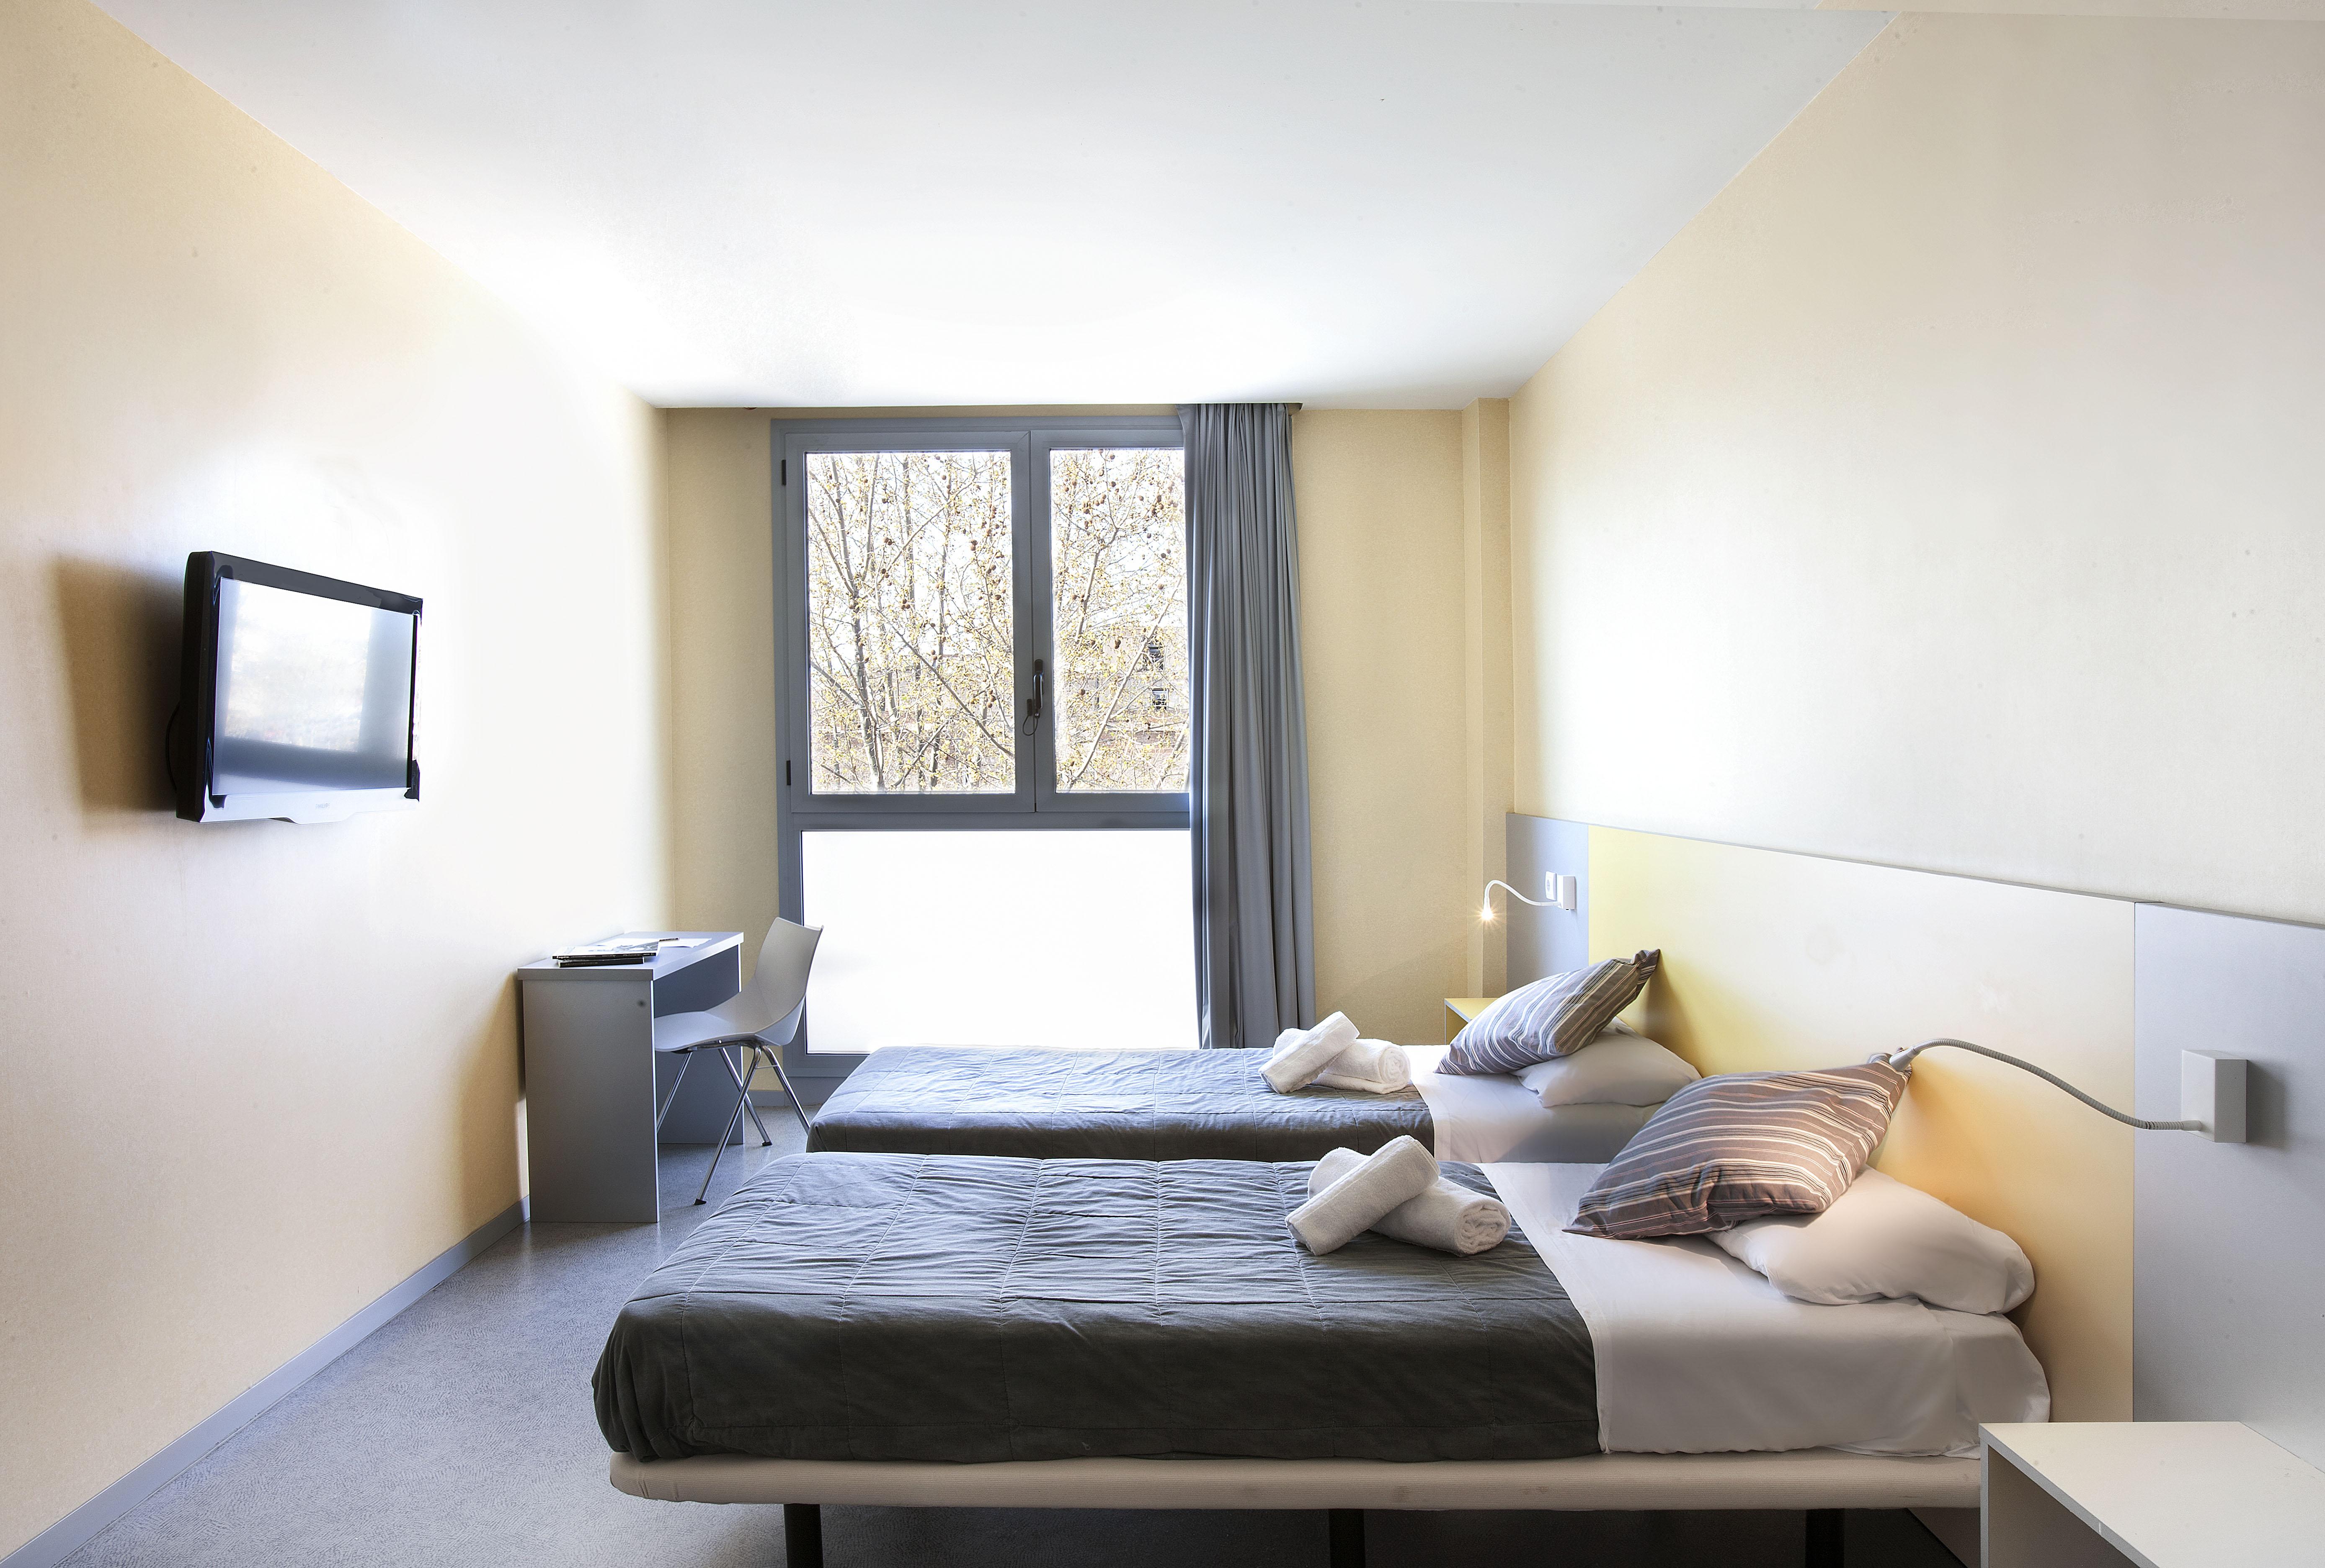 fe9ed47a4f individual room